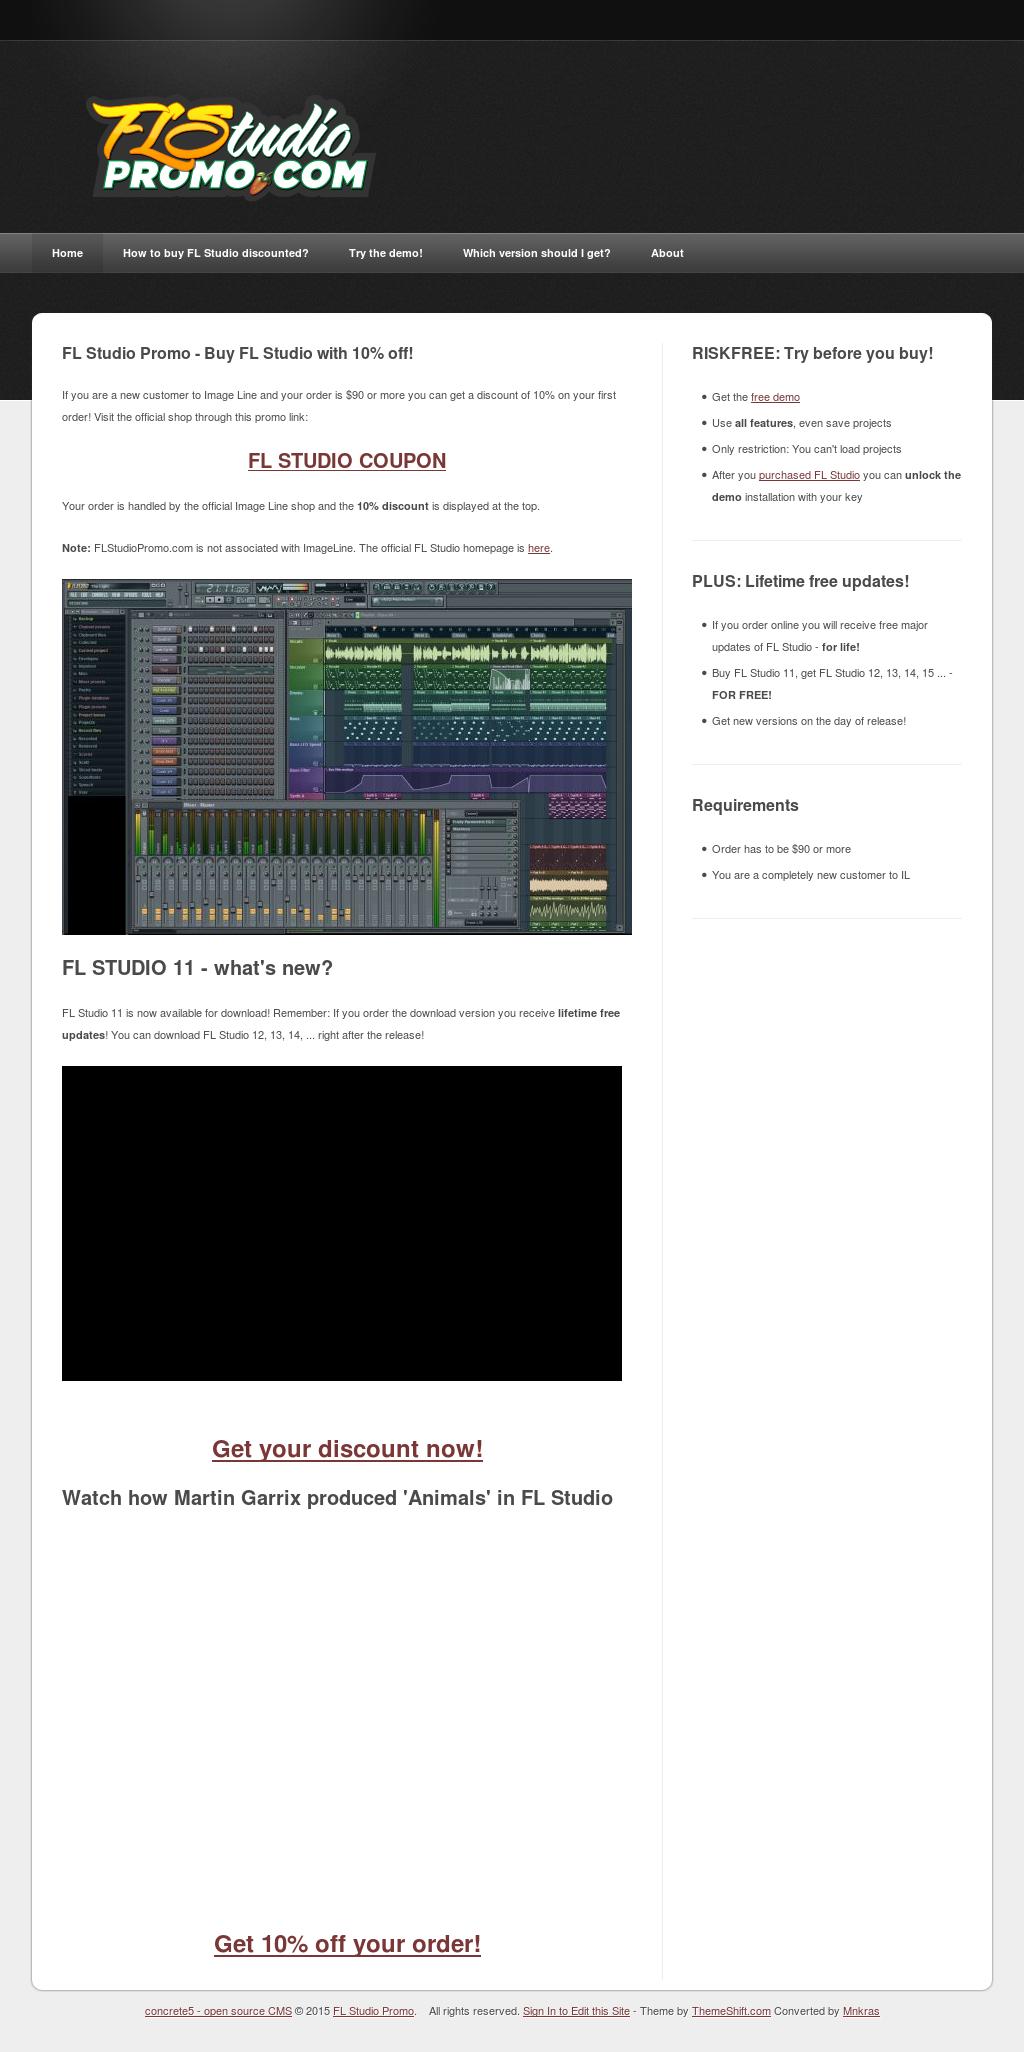 download fl studio 11 no demo